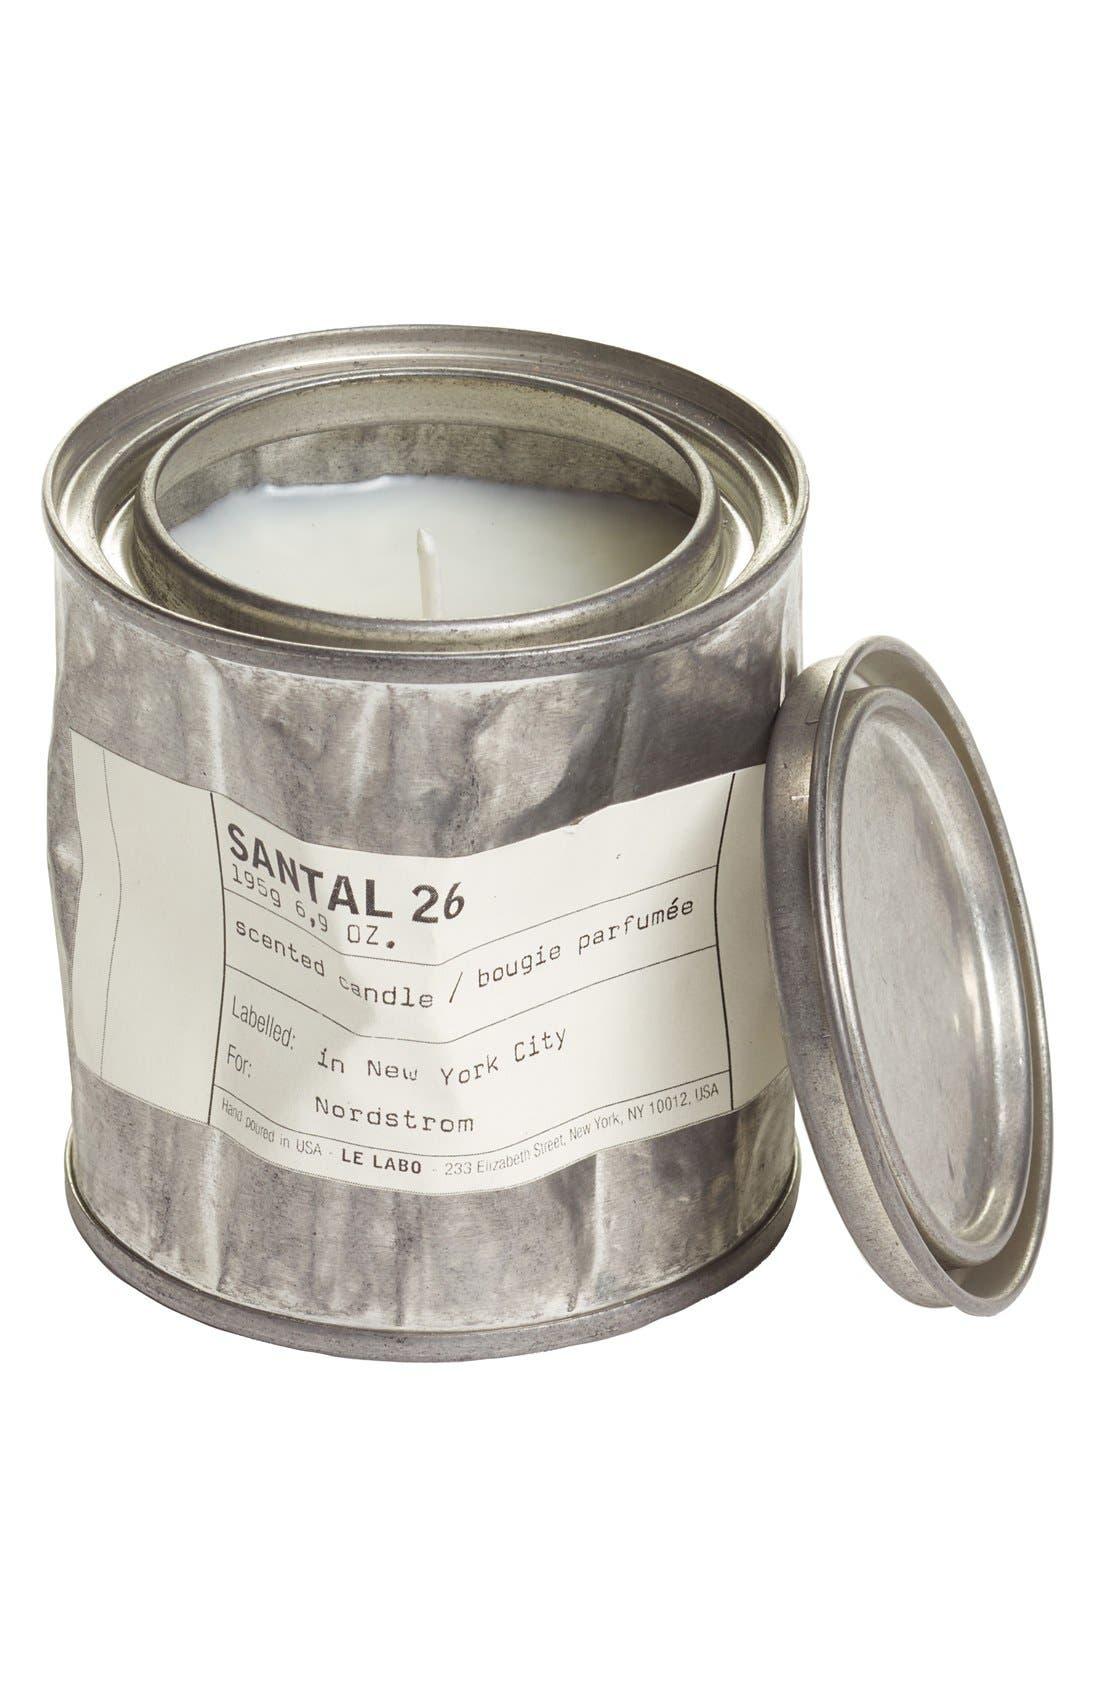 'Santal 26' Vintage Tin Candle,                         Main,                         color, NO COLOR